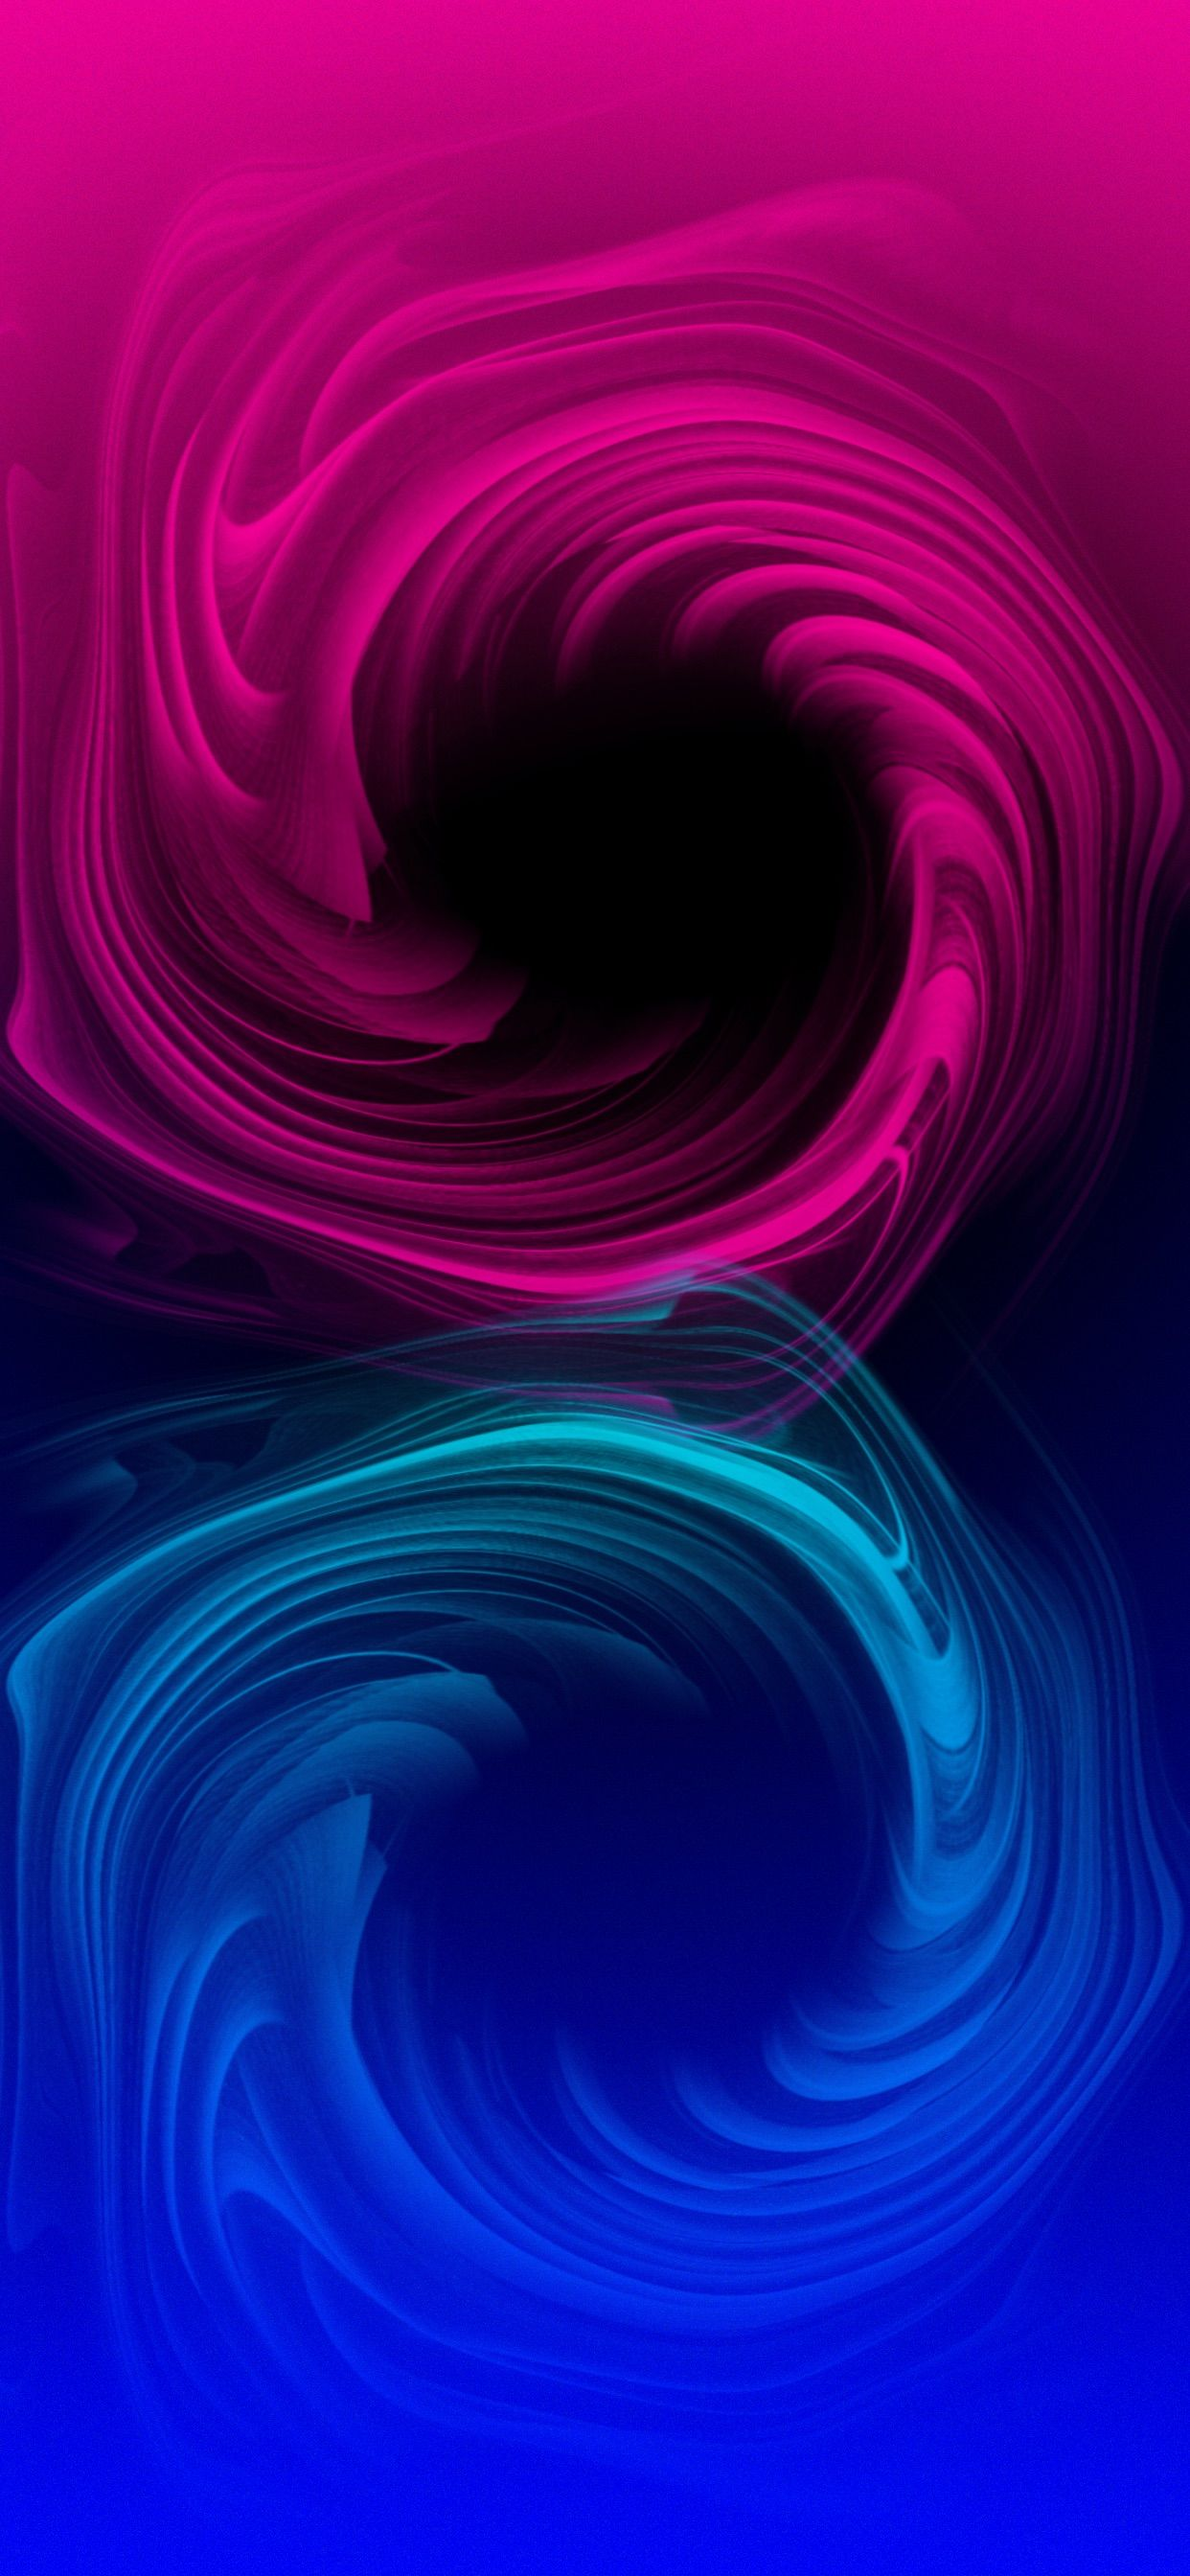 Pin by Satishjain JainS.C on Art abstract Storm